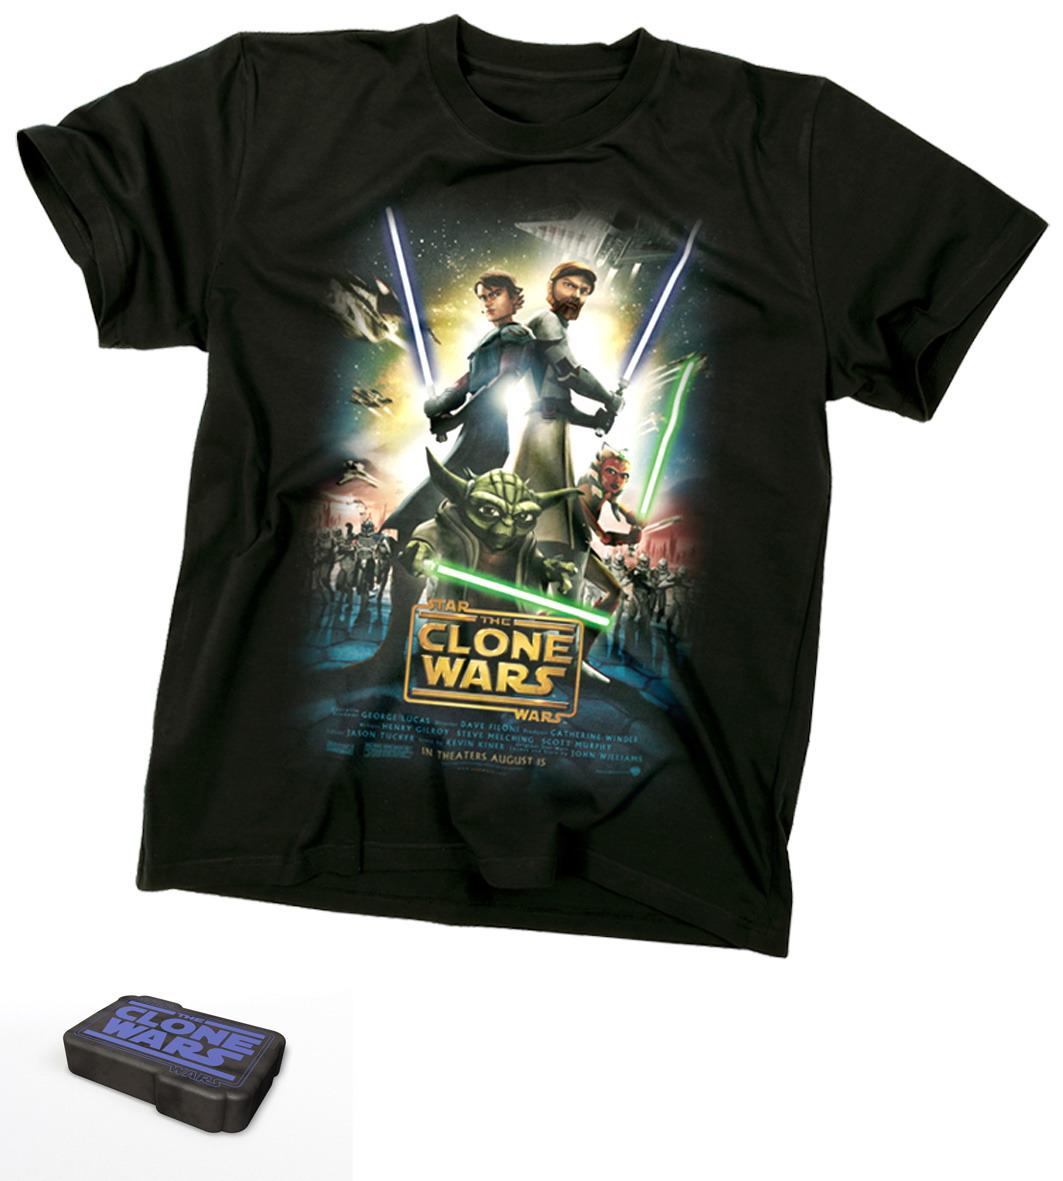 Camiseta personalizada prensada